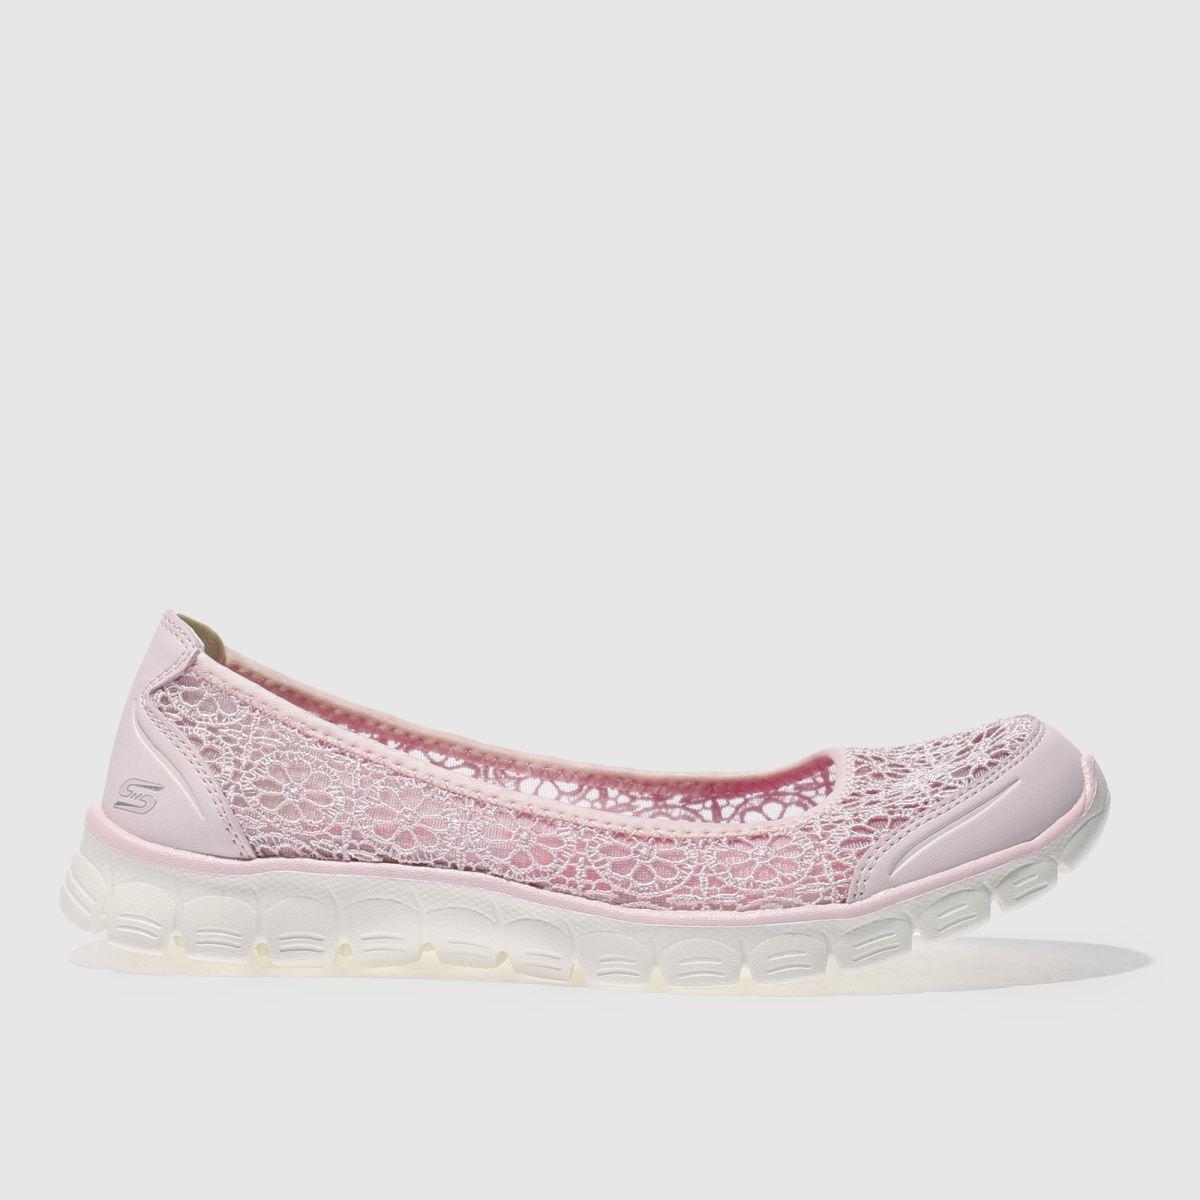 skechers pale pink ez flex 3-0 majesty trainers